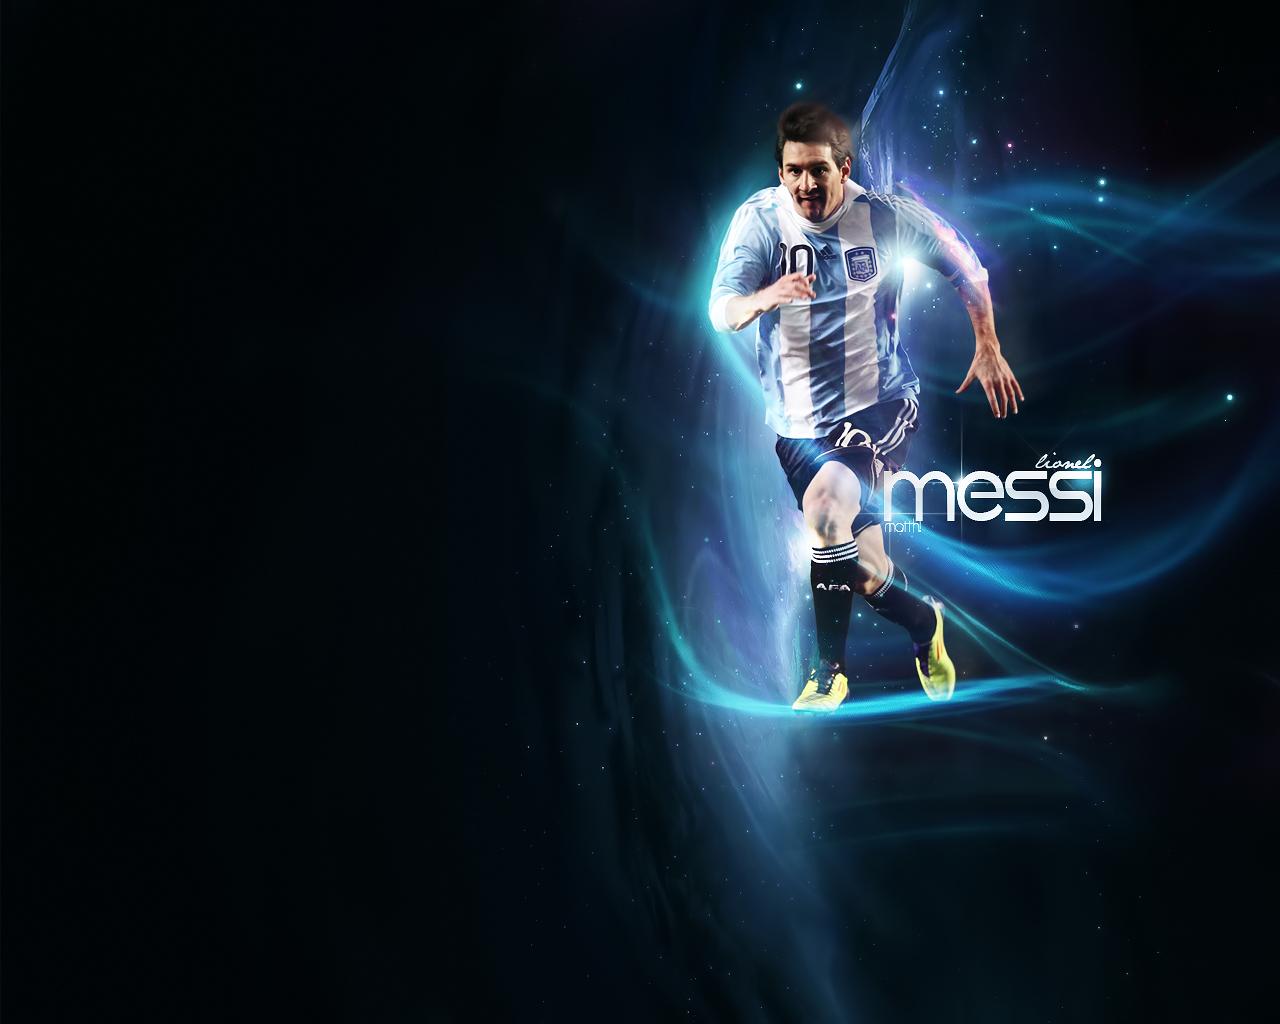 78 ] Wallpapers Lionel Messi On WallpaperSafari